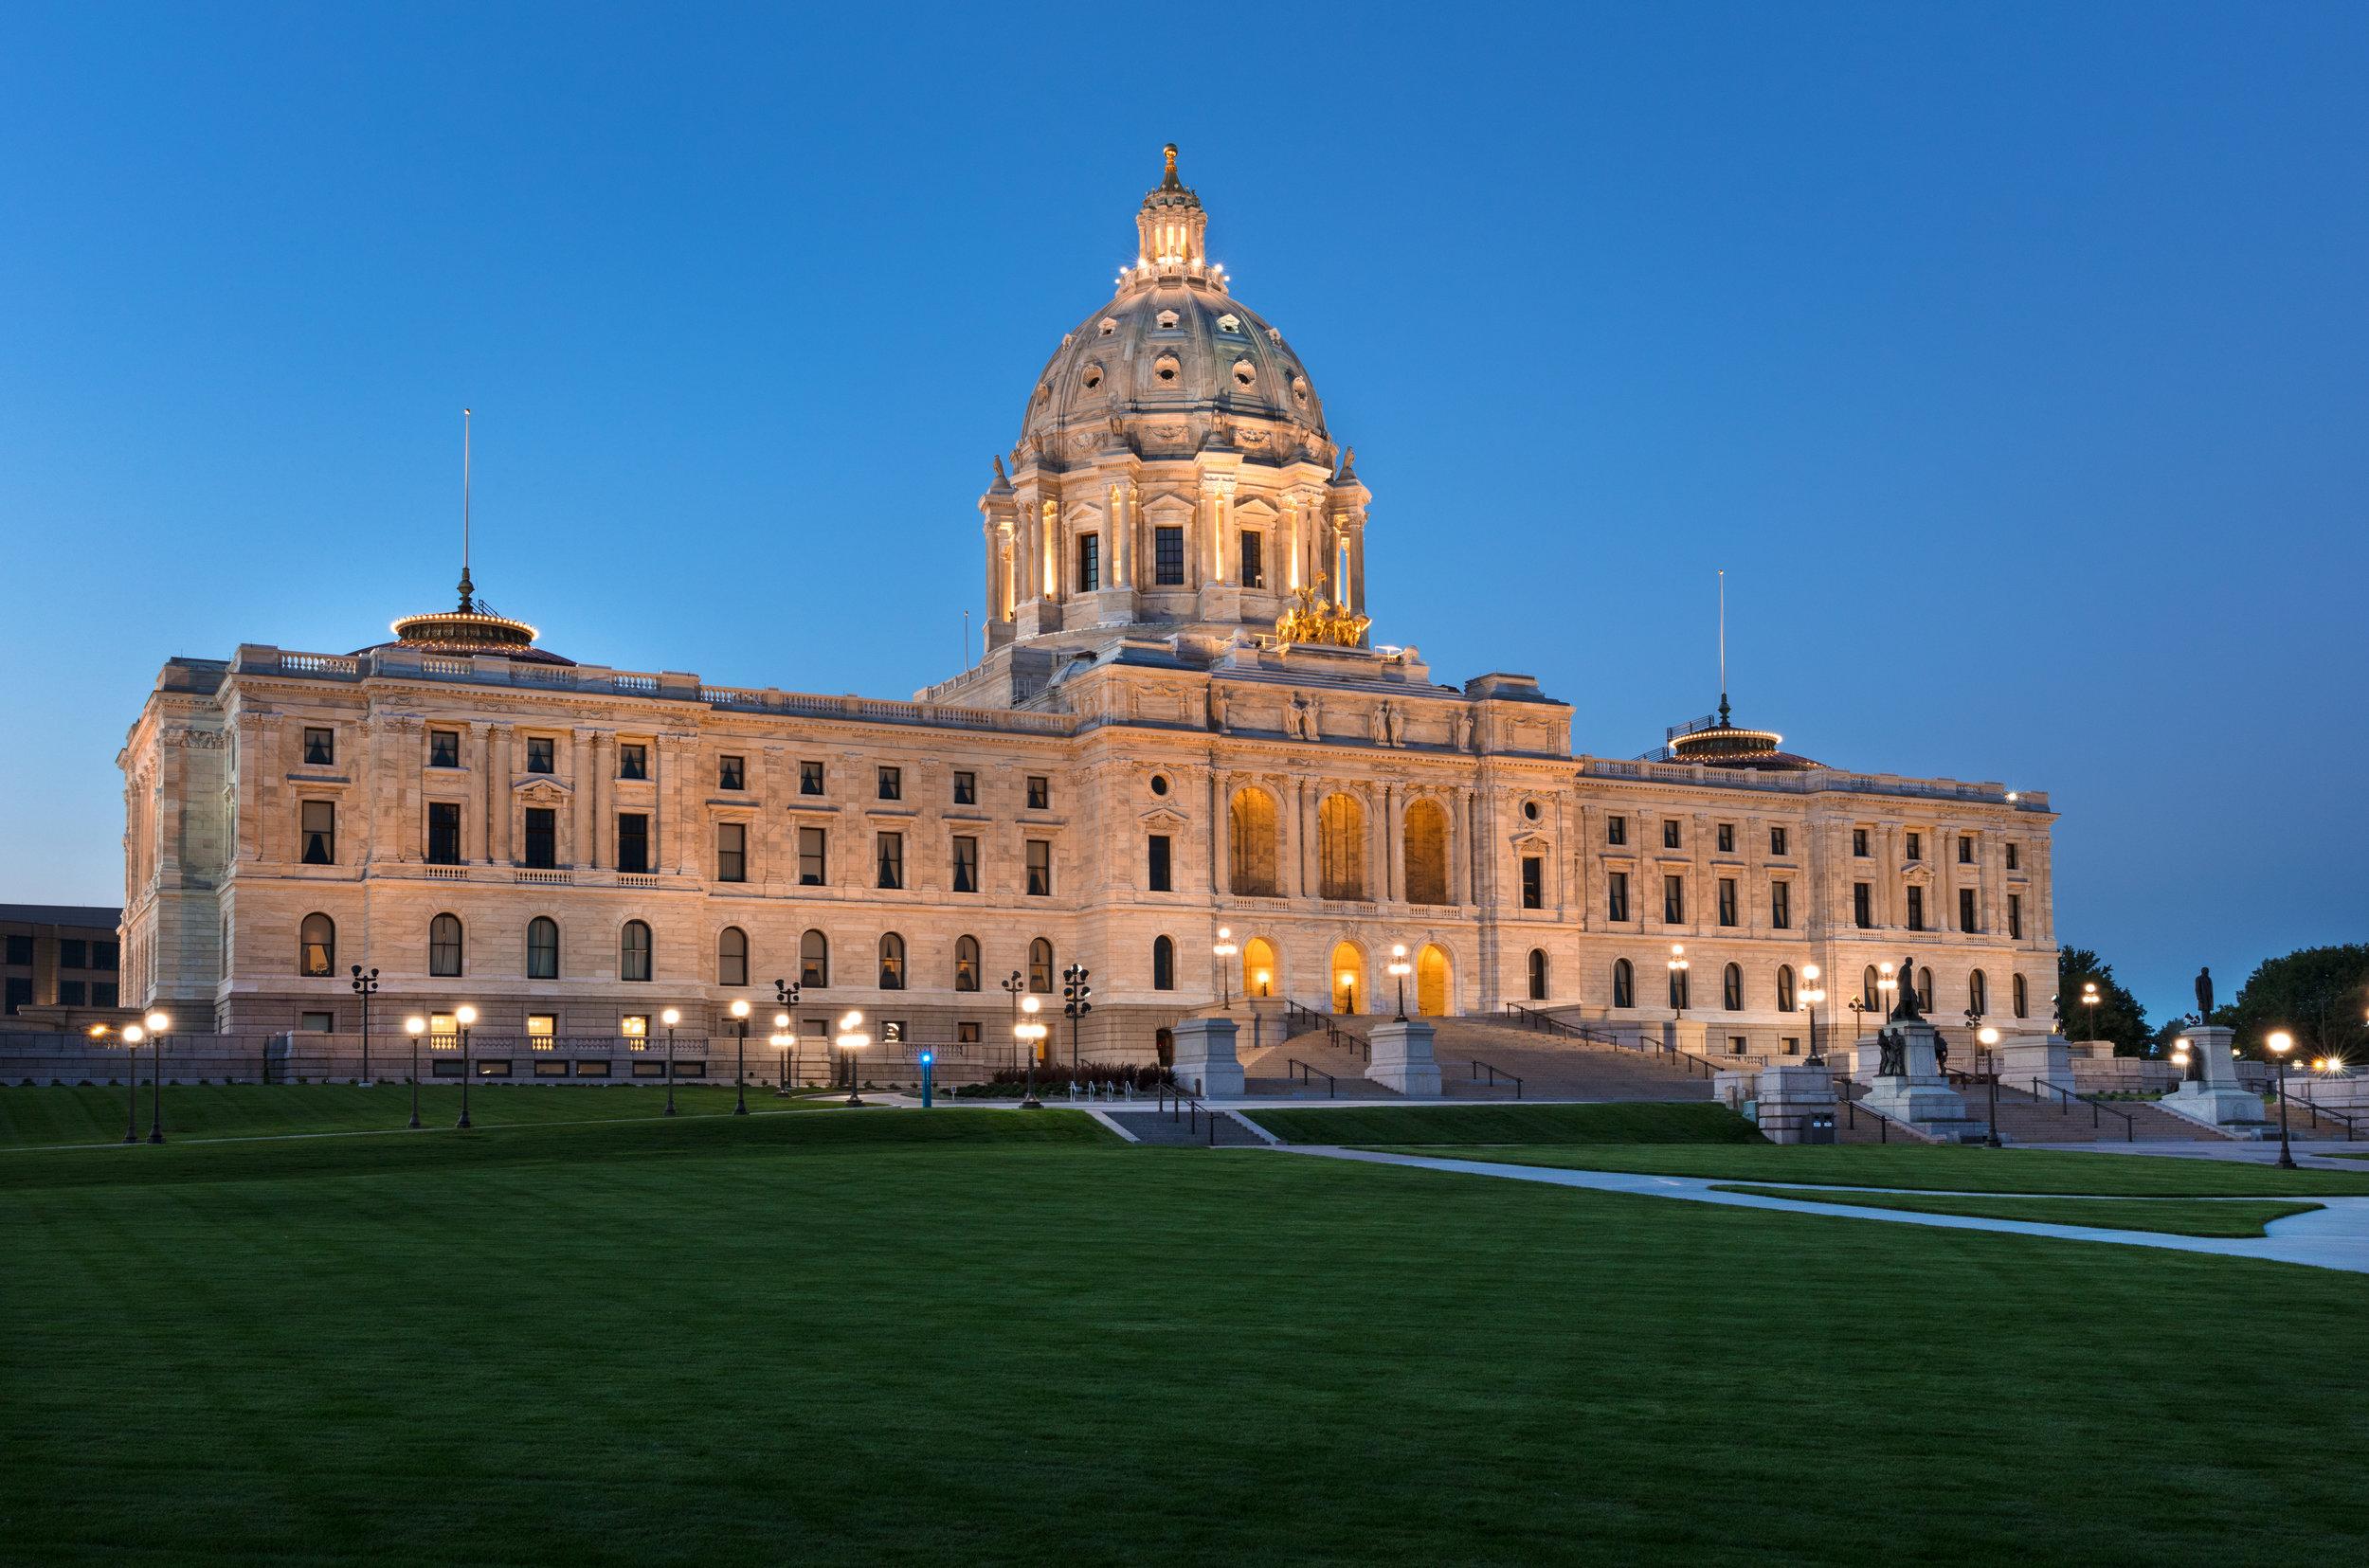 Architect: Minnesota State Capitol